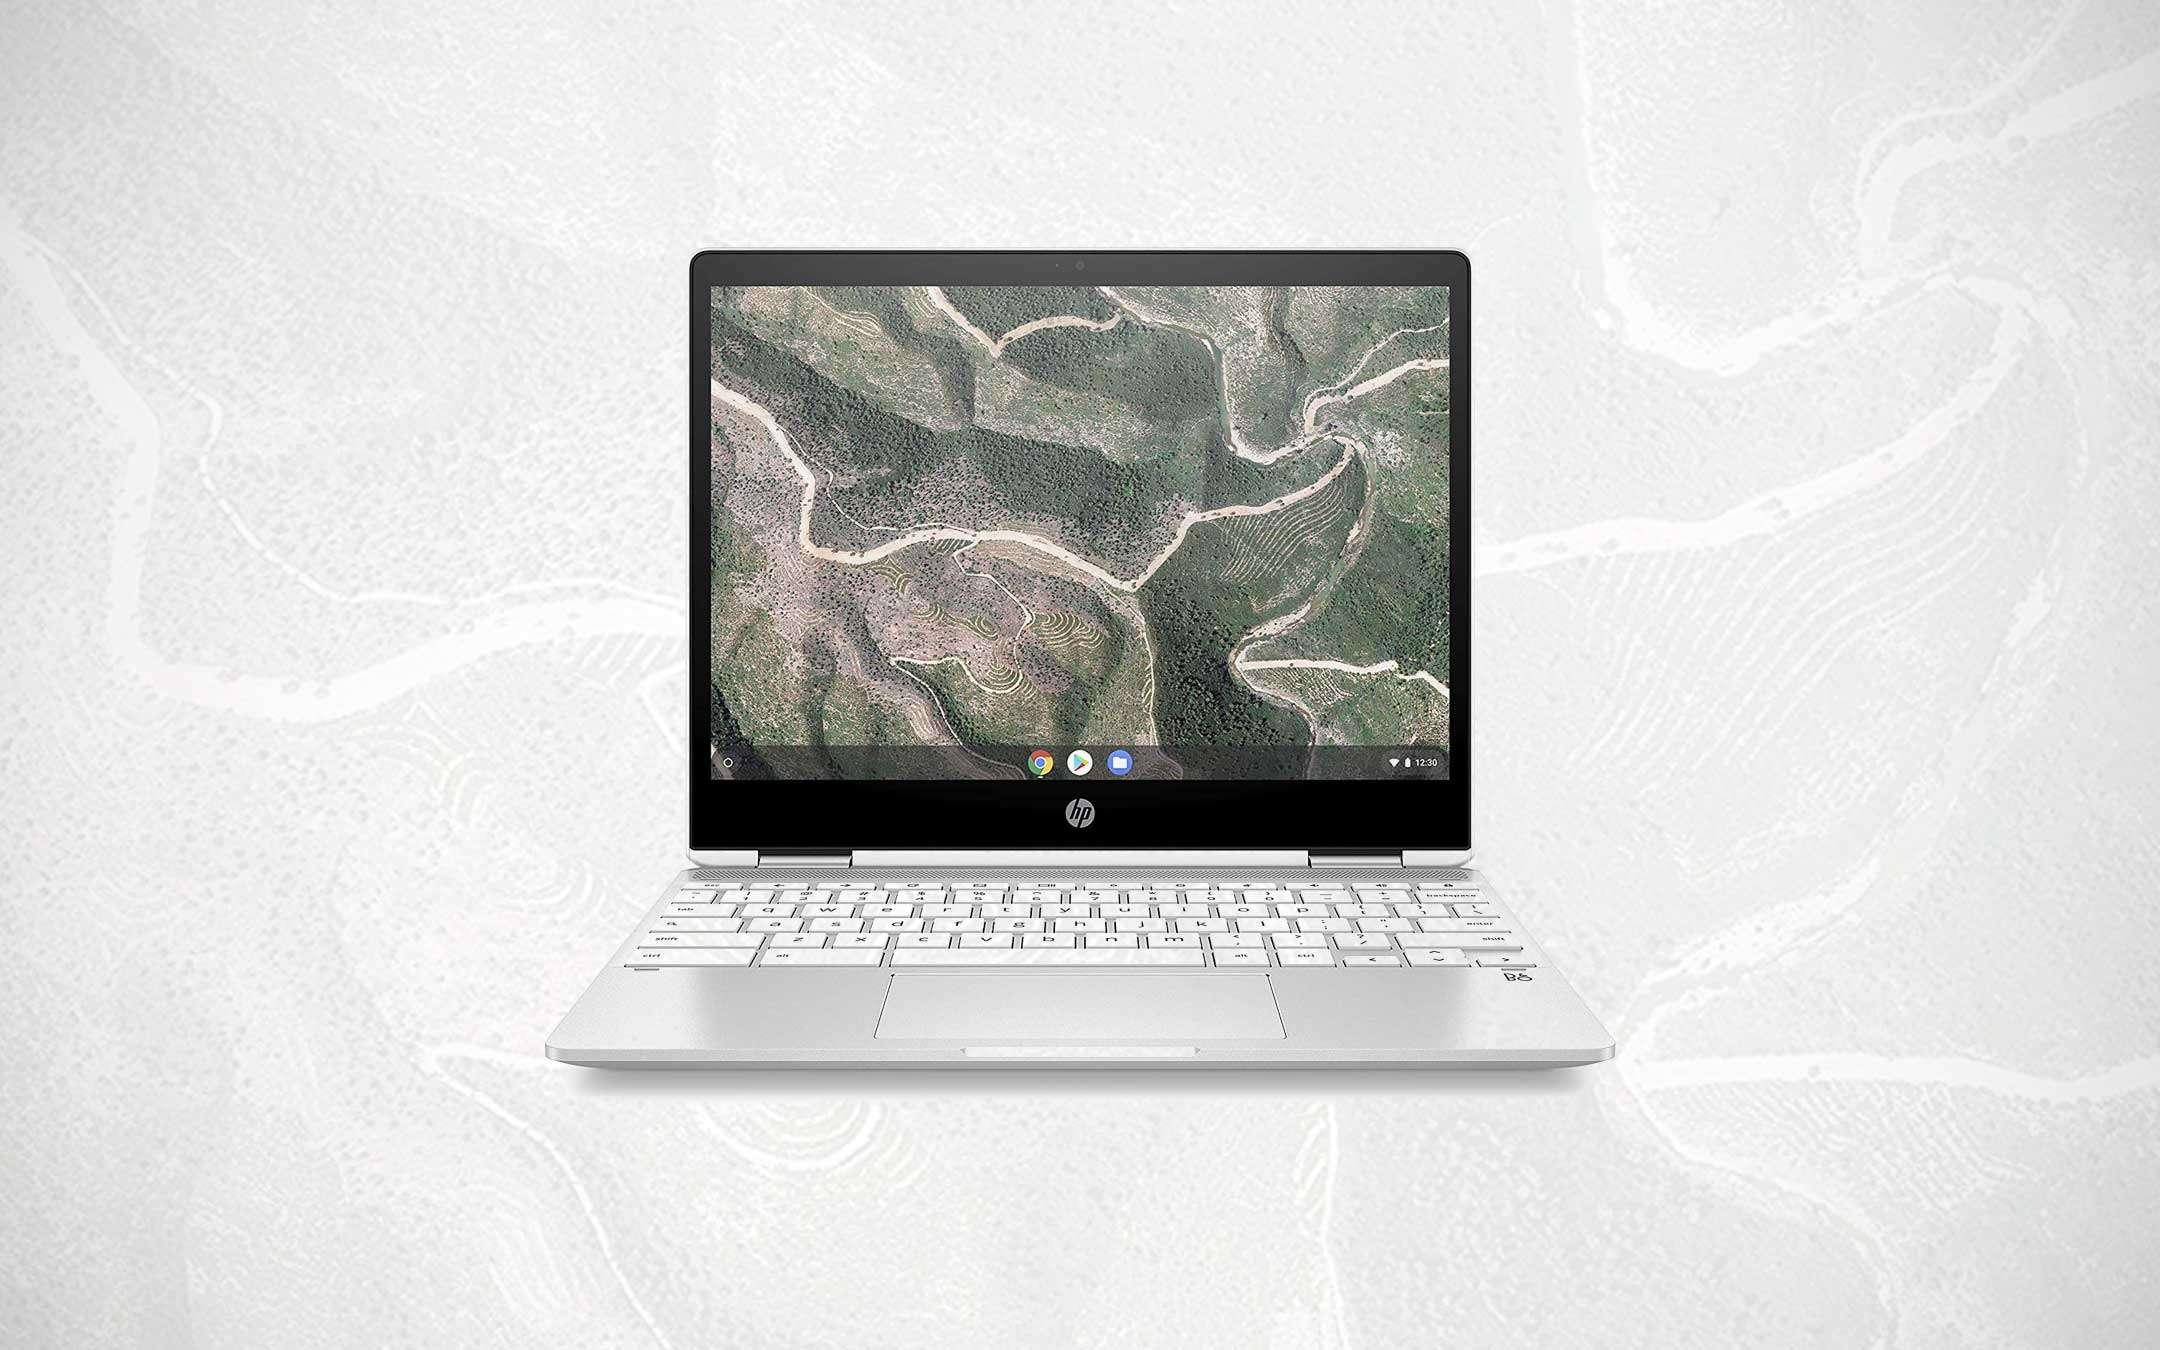 HP Chromebook x360 12b: the Black Friday offer